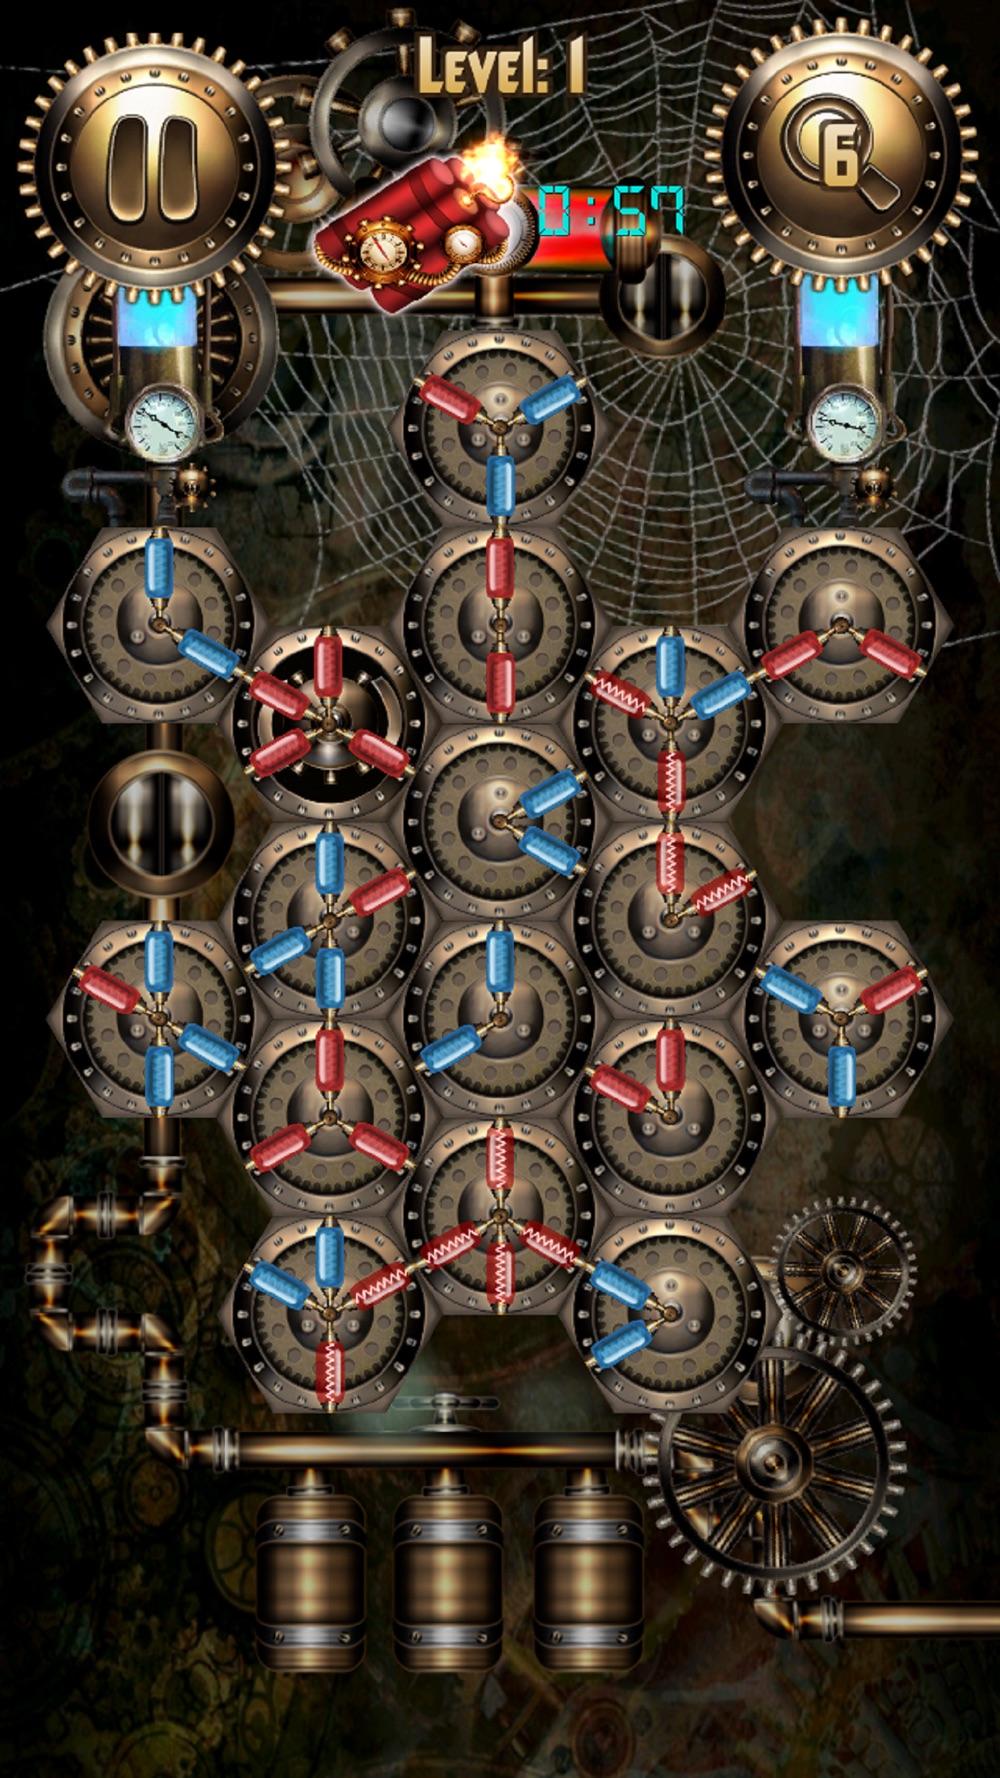 Mechanicus logic brain puzzle Cheat Codes